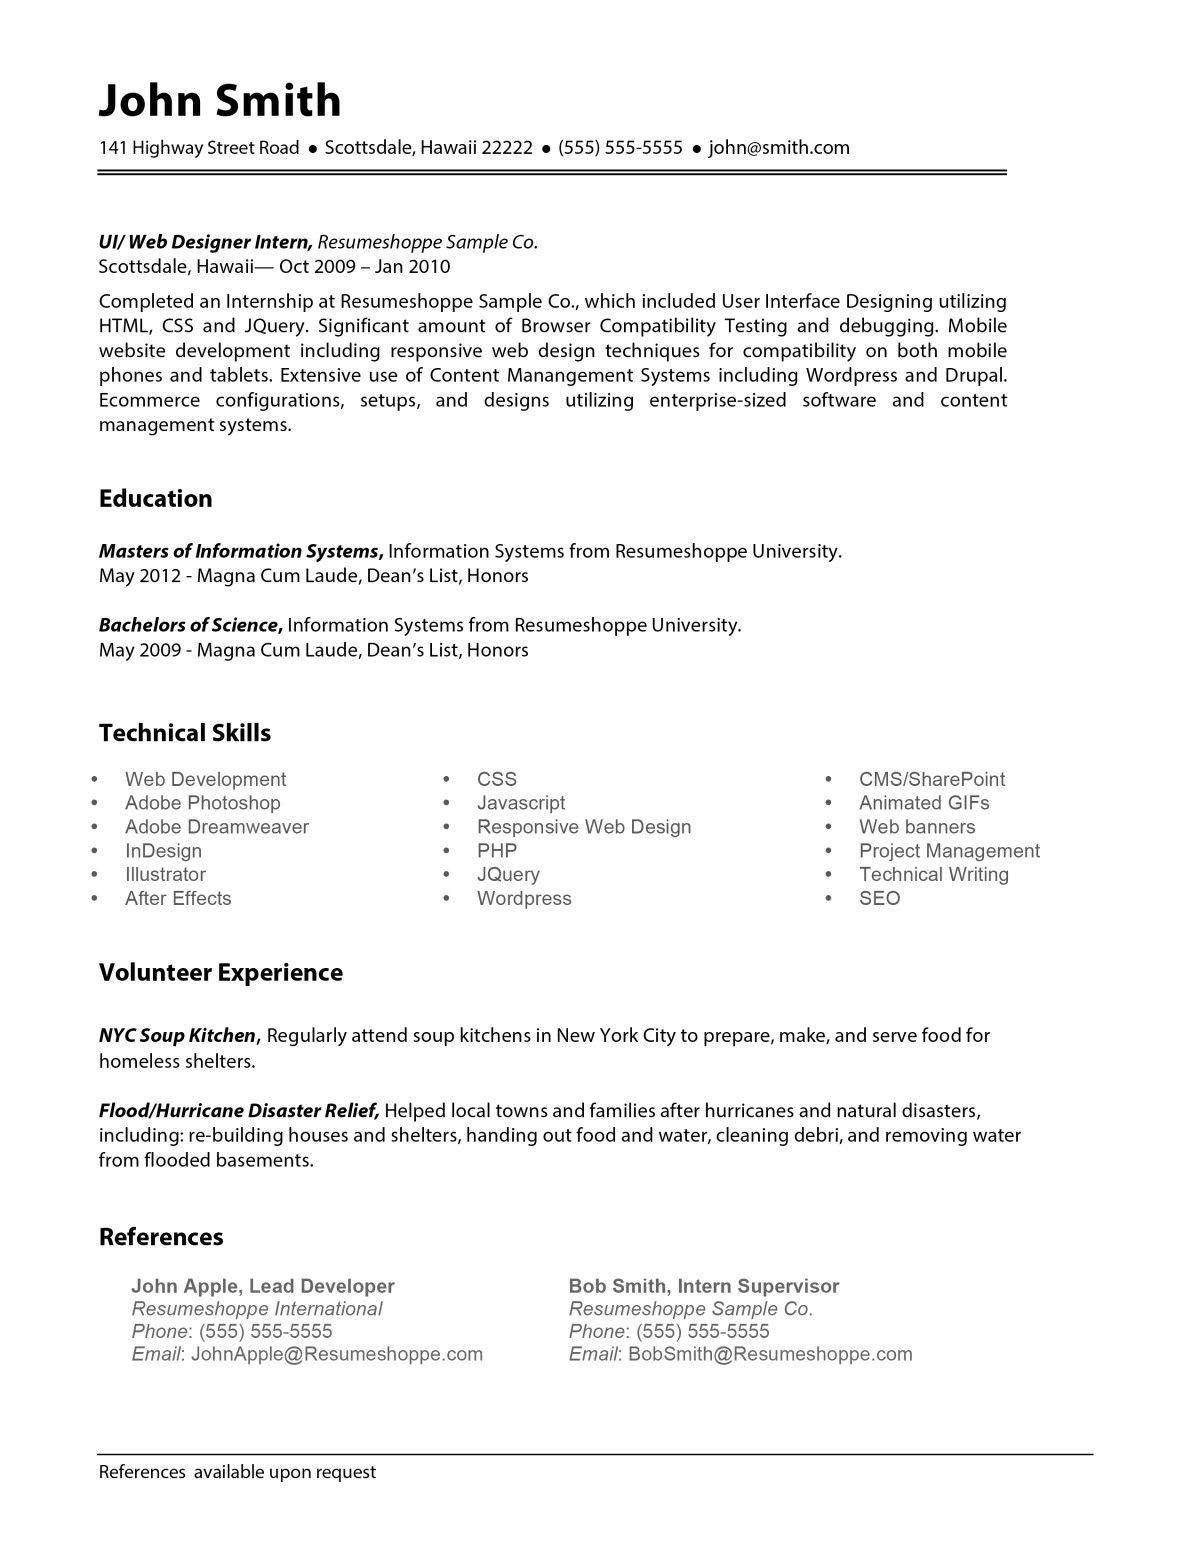 The John Resume Resume, Resume template professional